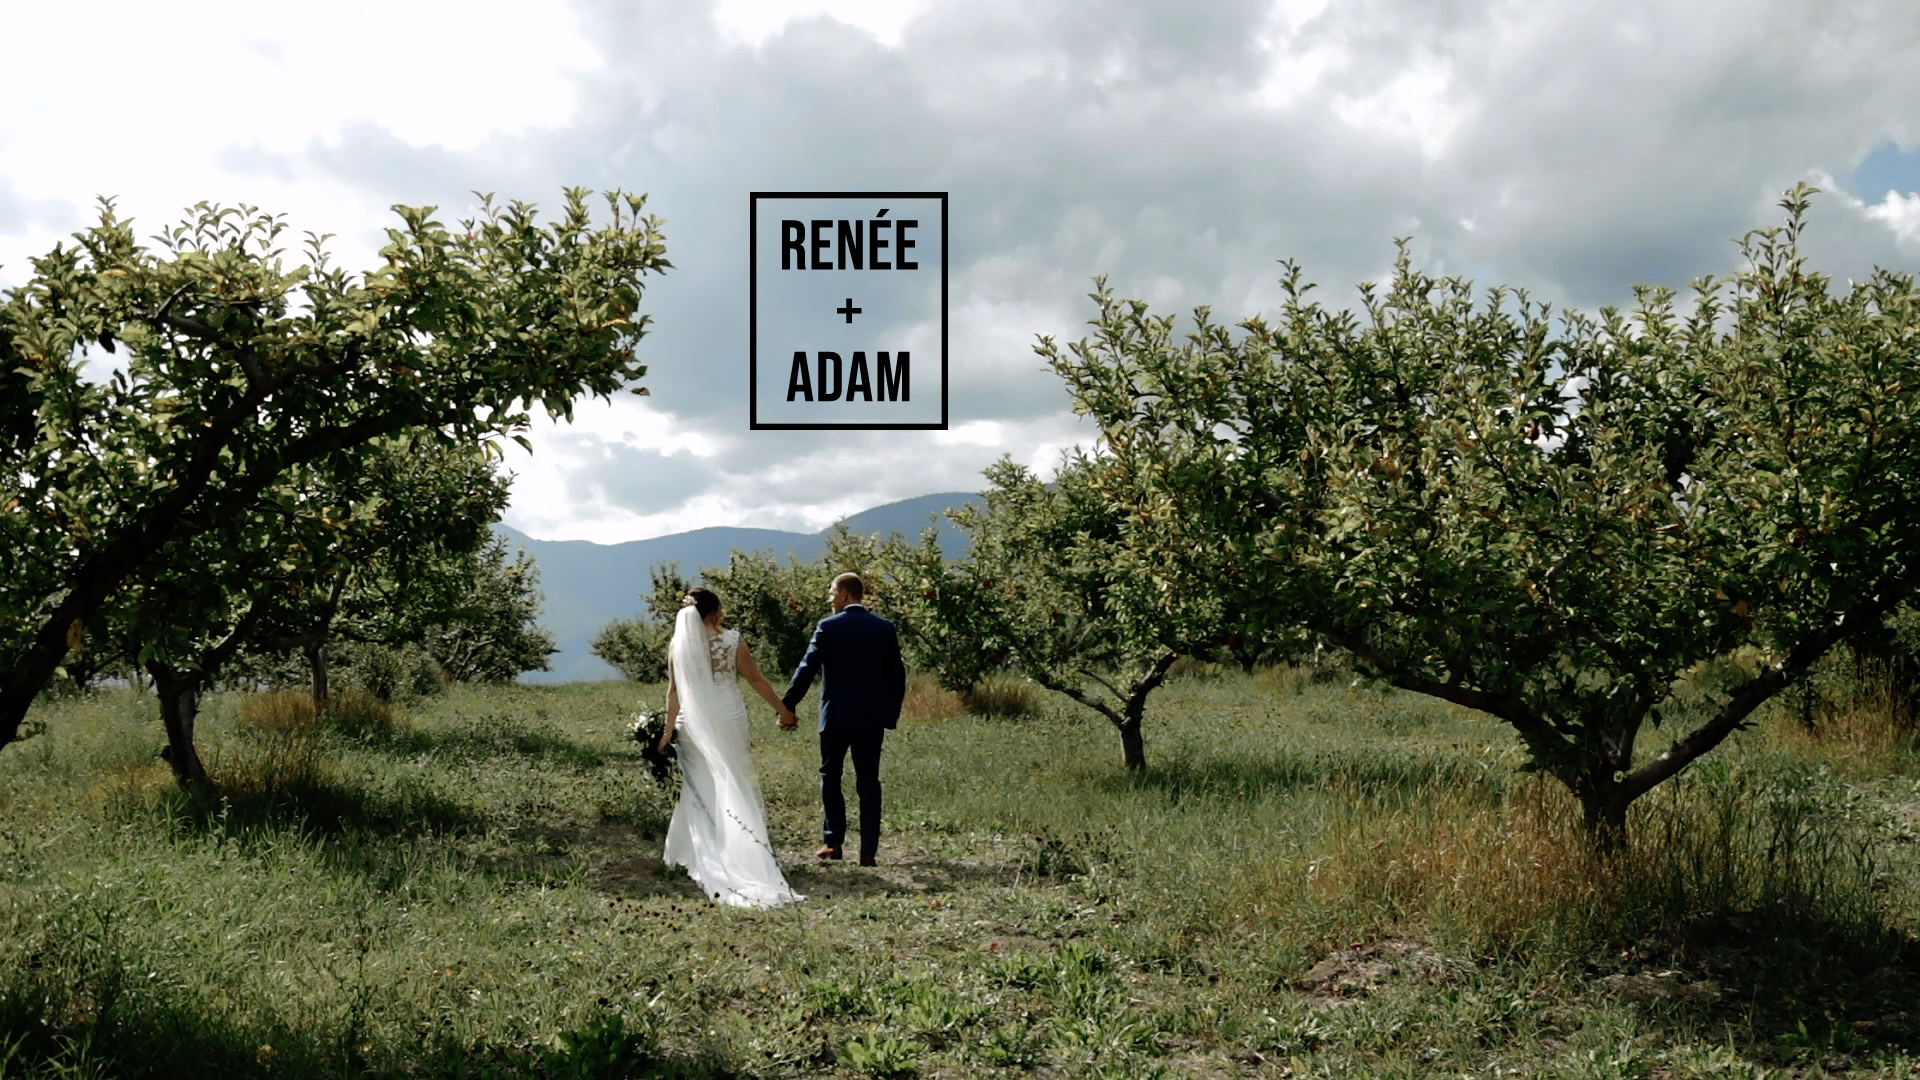 Renée + Adam   Salmon Arm, Canada   Family Property